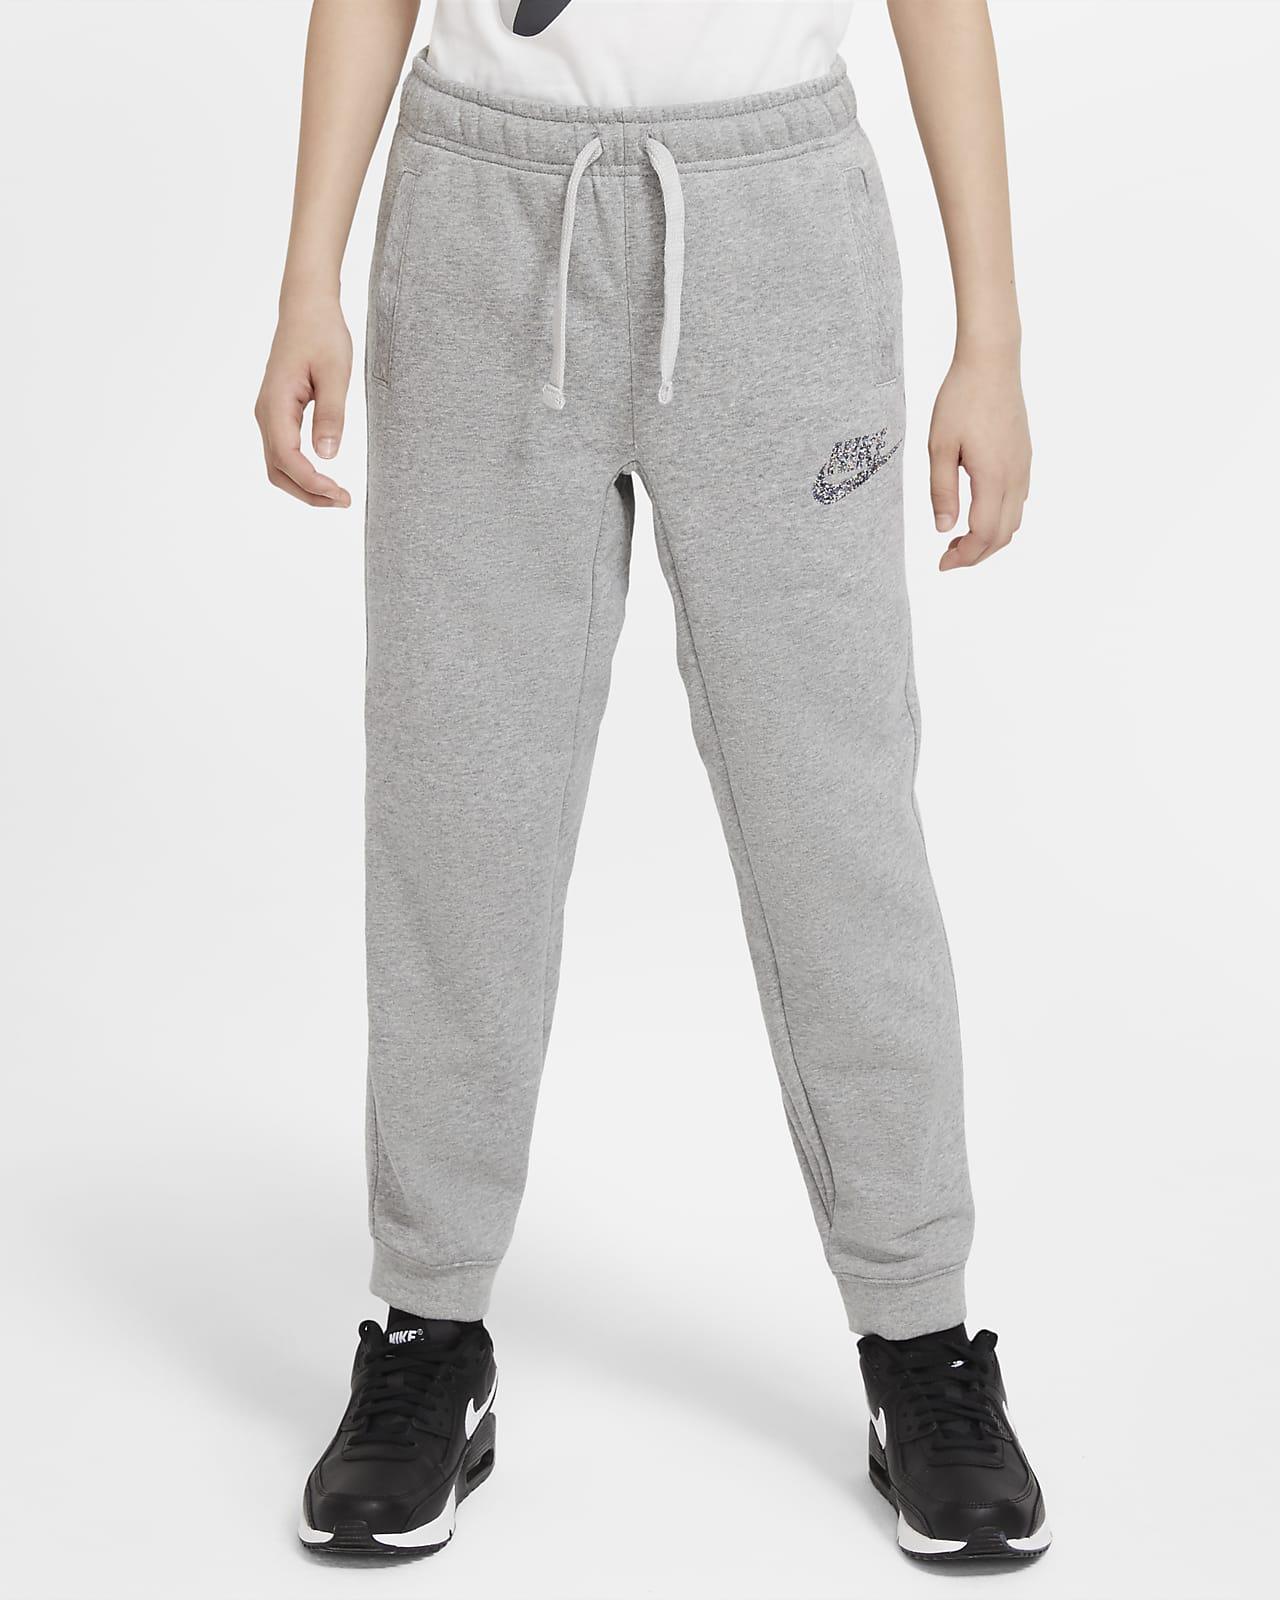 Nike Sportswear Big Kids' Pants